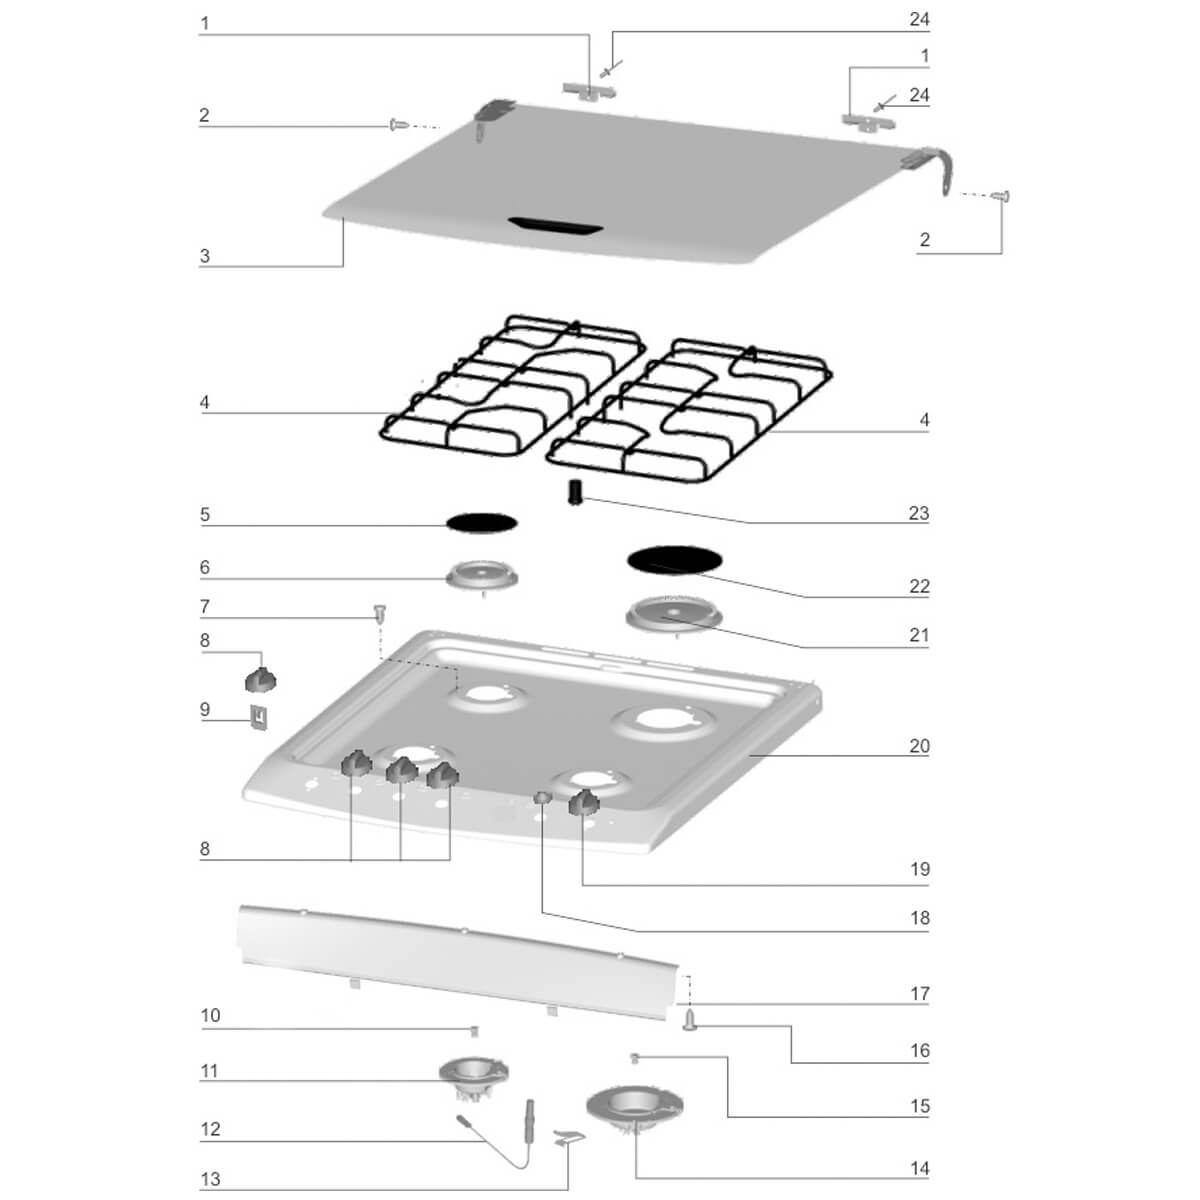 Capa Esmaltada Queimador Rápido Fogão Electrolux -  62603788